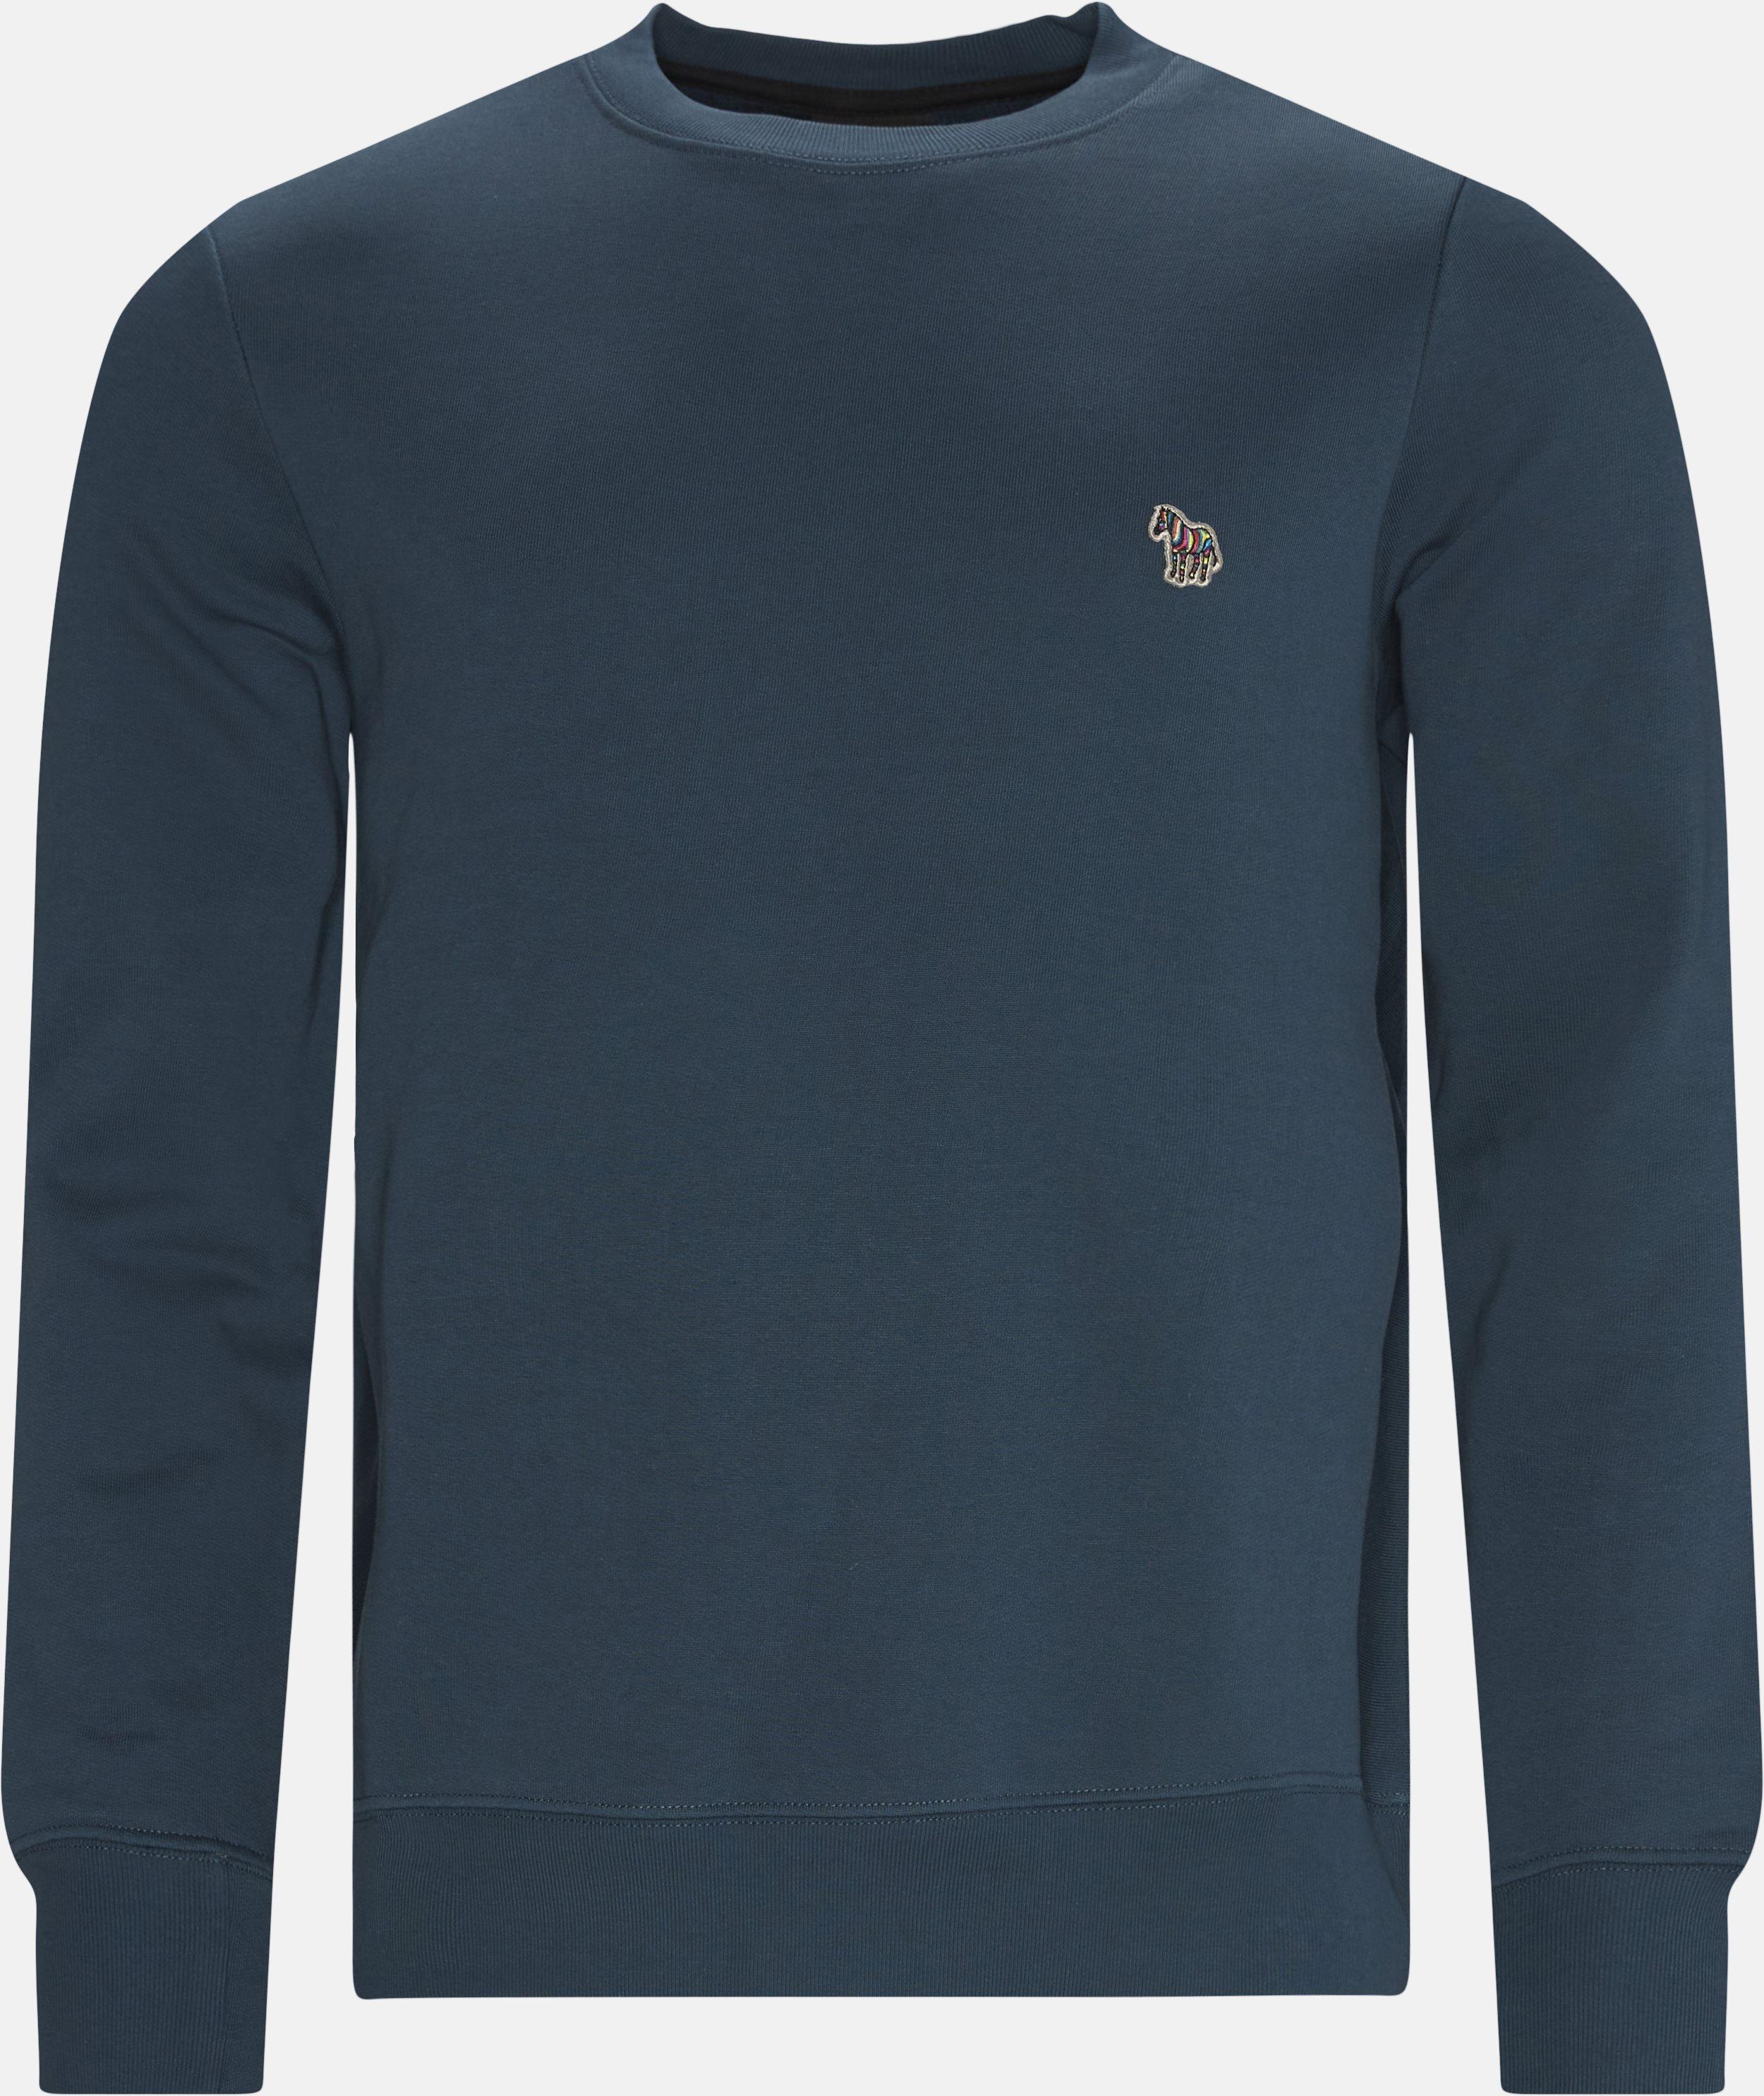 Crewneck Sweatshirt - Sweatshirts - Regular fit - Blå